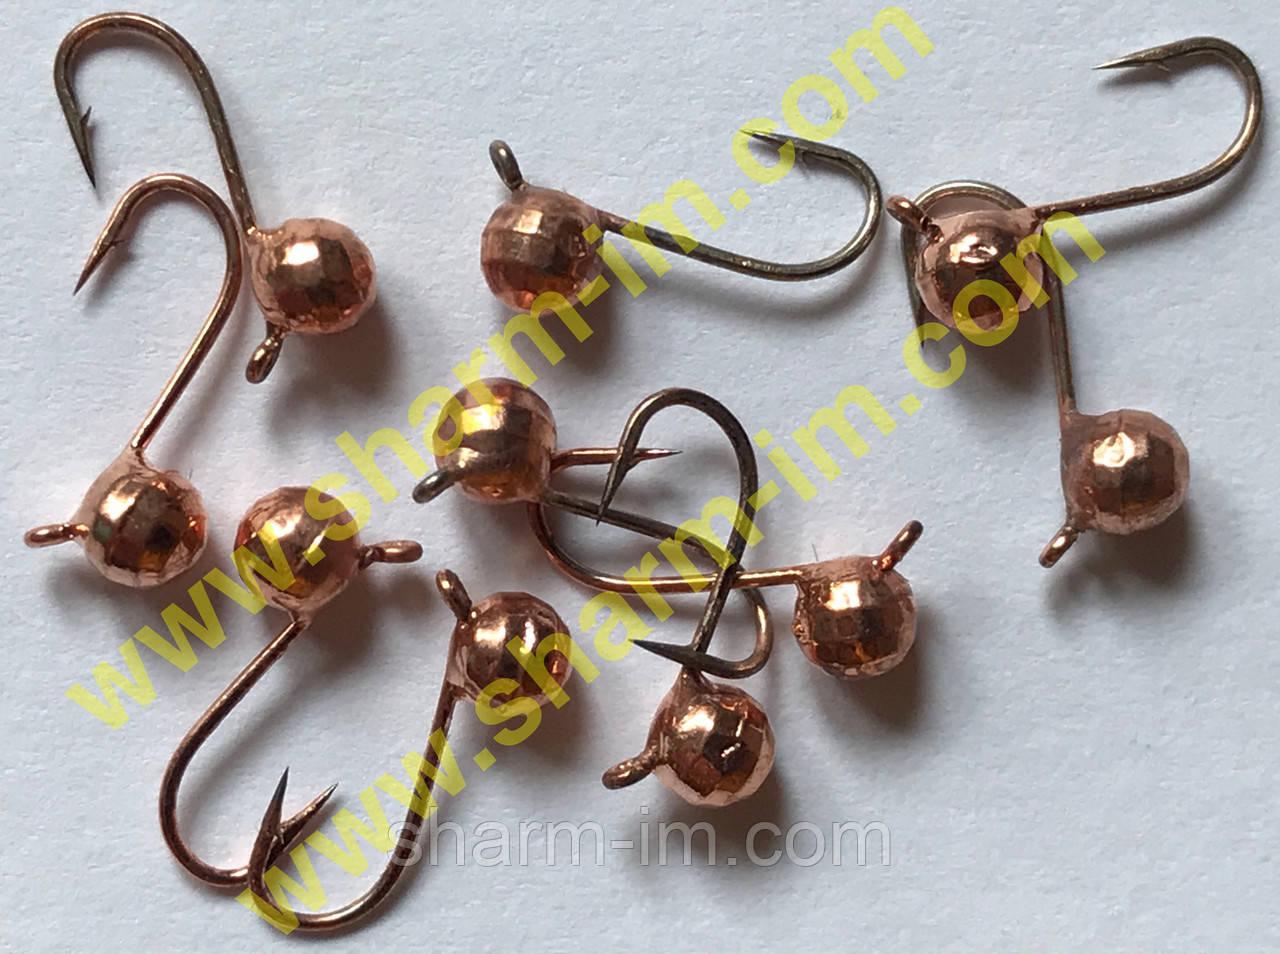 Мормышка вольфрамовая Bravo 1730B-CU 3,0 мм 0,24 гр. Шар граненый